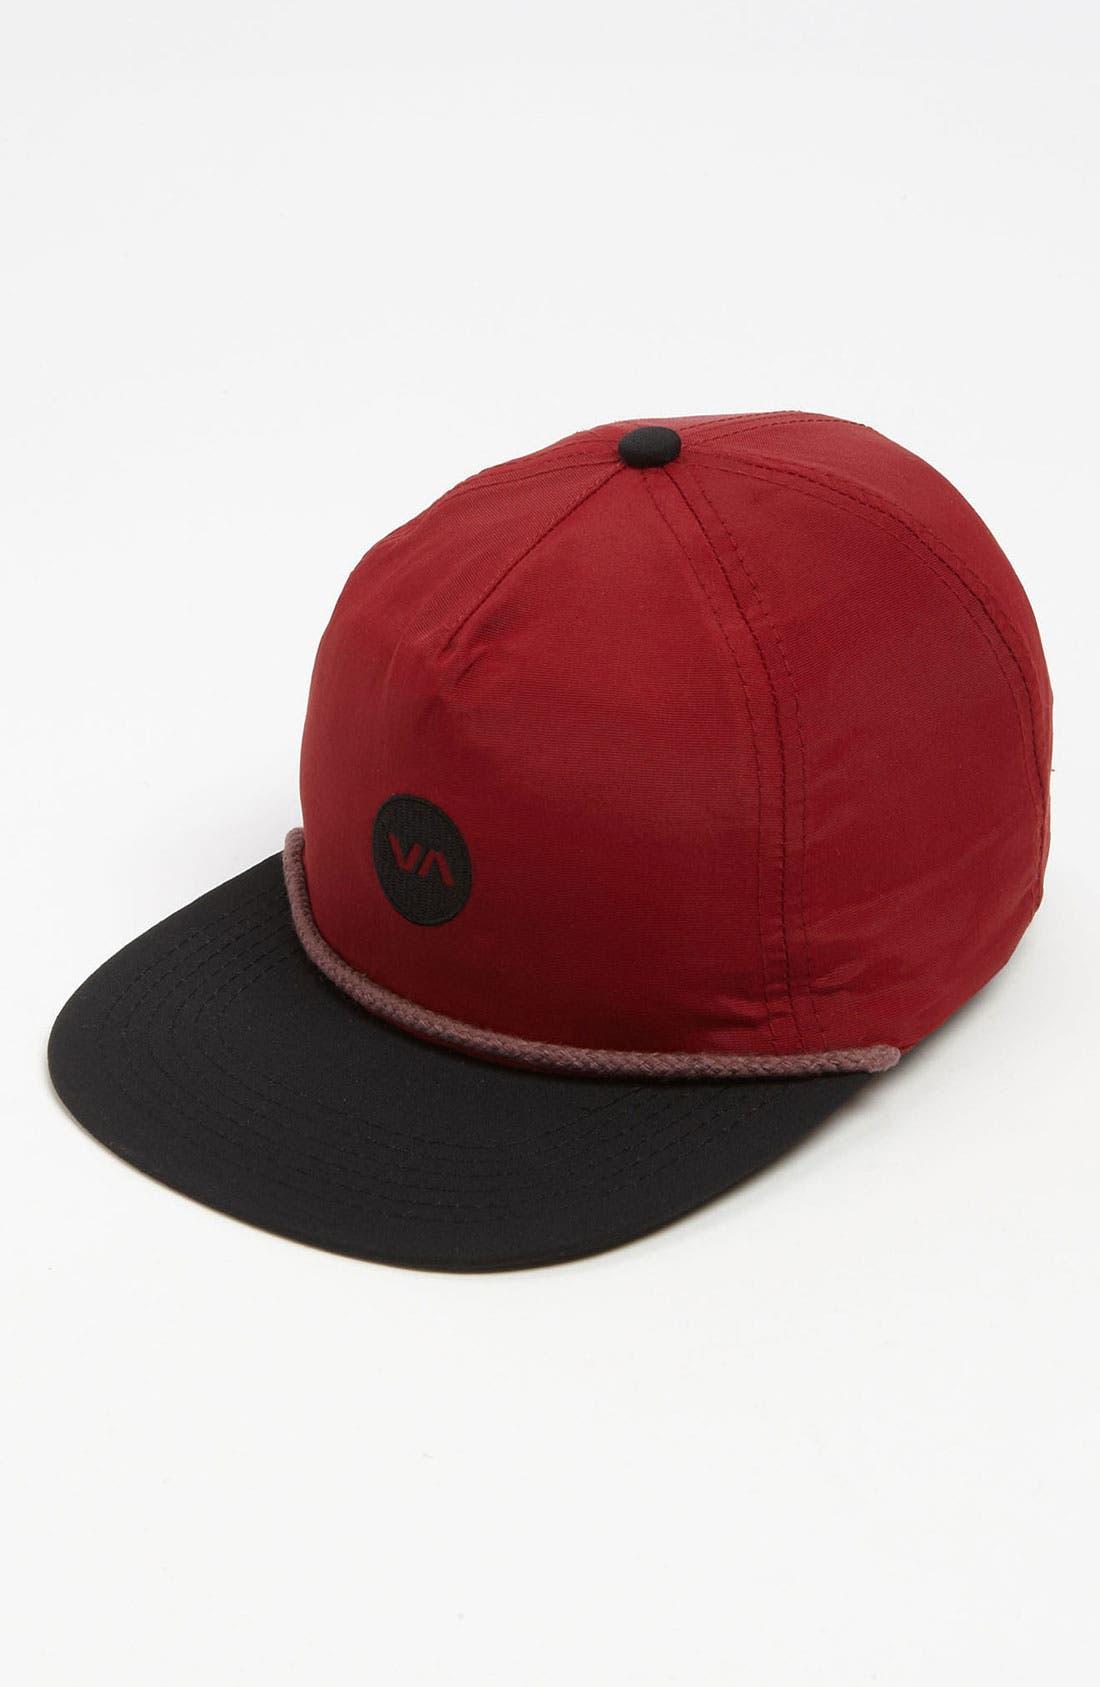 Main Image - RVCA 'Dot' Snapback Baseball Cap